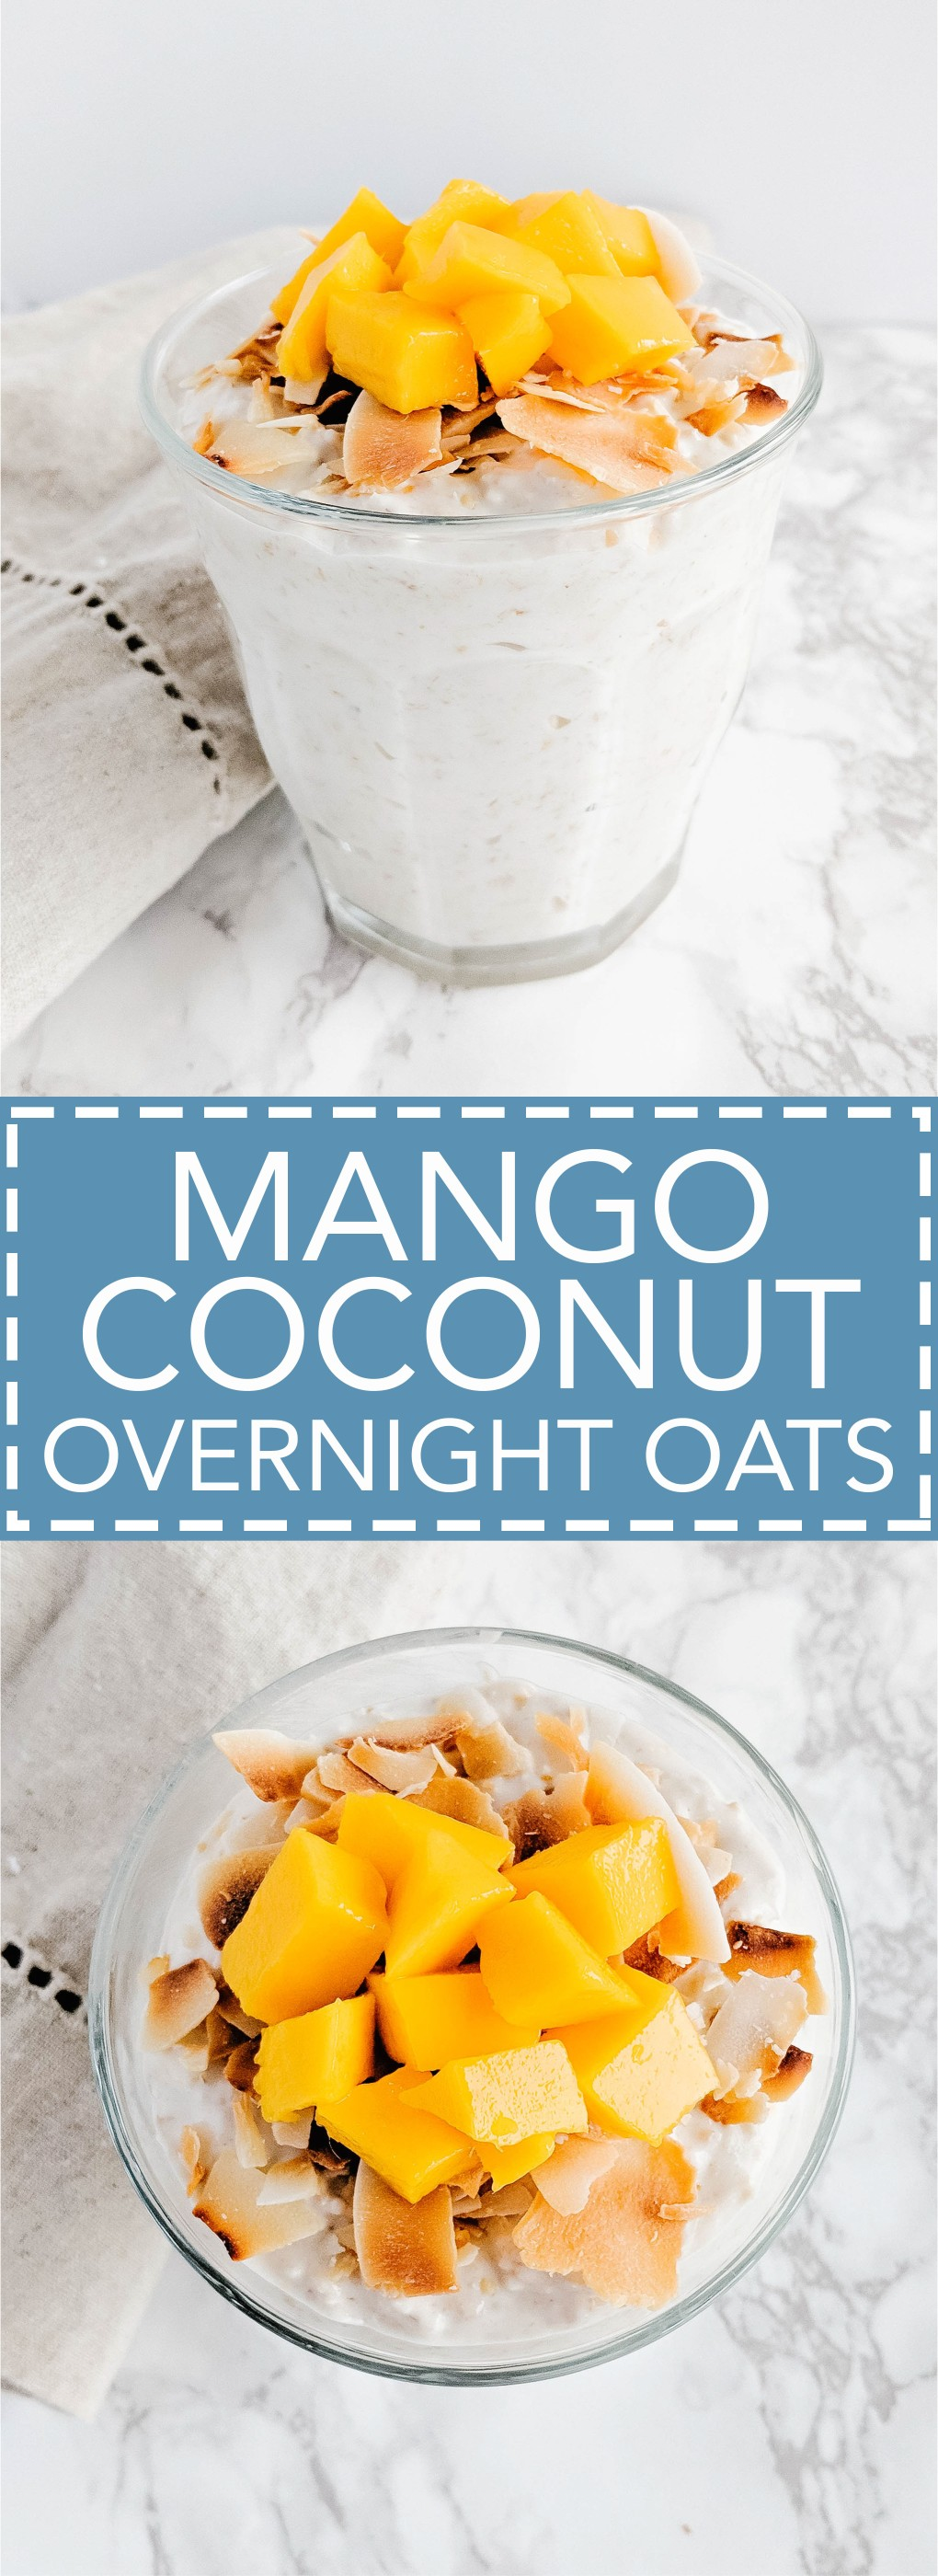 Healthy Mango Coconut Overnight Oats - Yum!